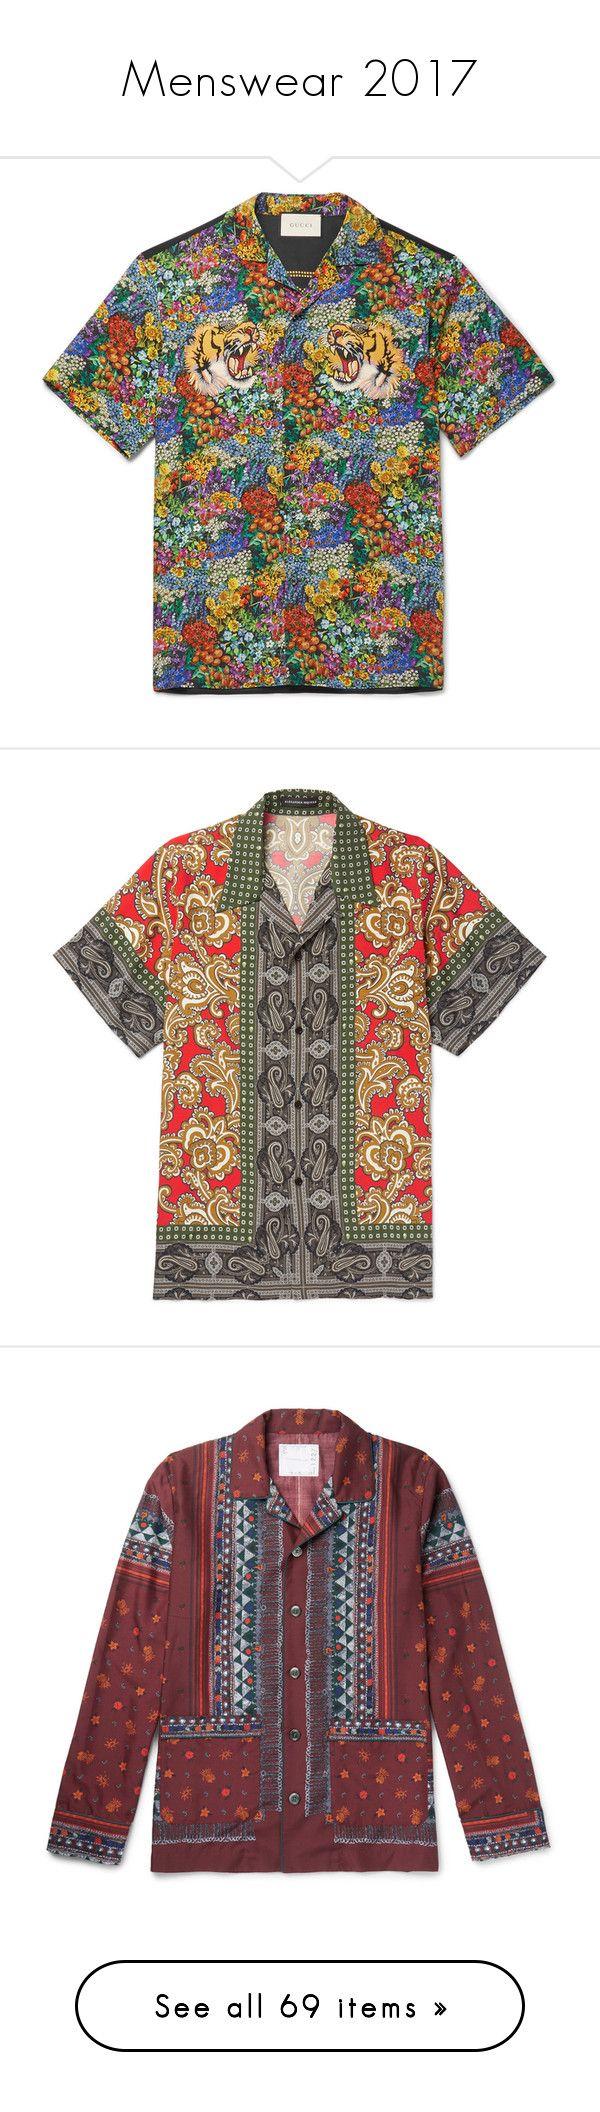 """Menswear 2017"" by jckyleeah ❤ liked on Polyvore featuring menswear, 2017, men's fashion, men's clothing, men's shirts, men's casual shirts, mens retro bowling shirts, men's flower print shirt, mens silk shirts and mens floral shirts"